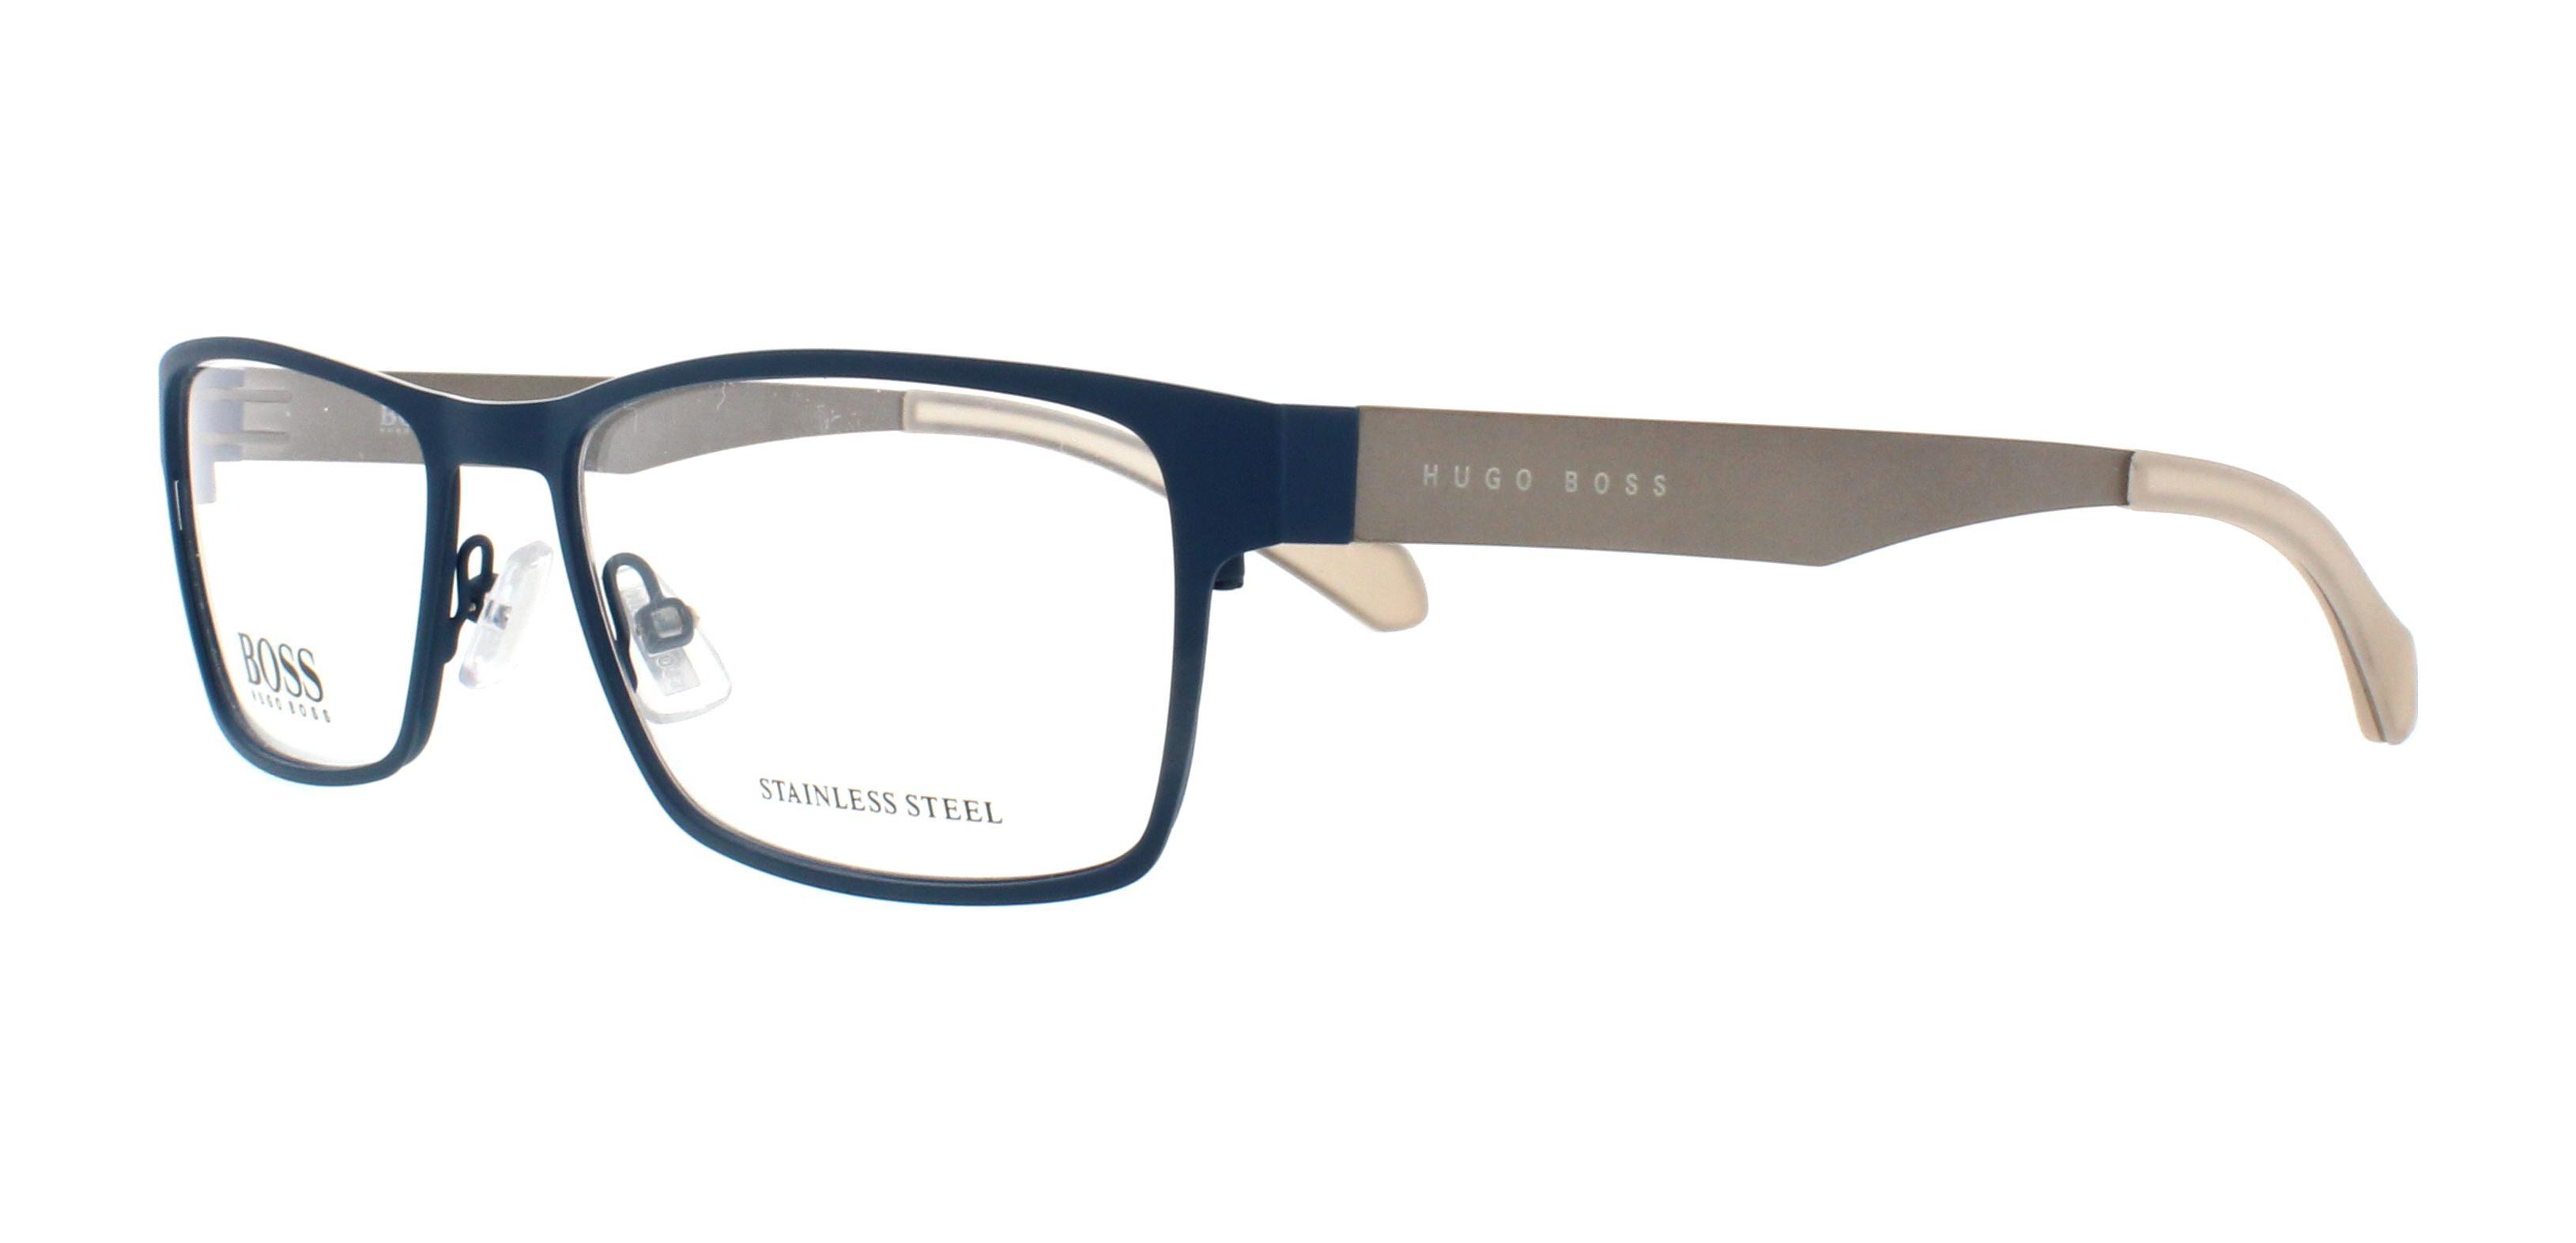 2afe4dd6ef HUGO BOSS Eyeglasses 0873 005Q Matte Blue Gray 54MM 762753502926